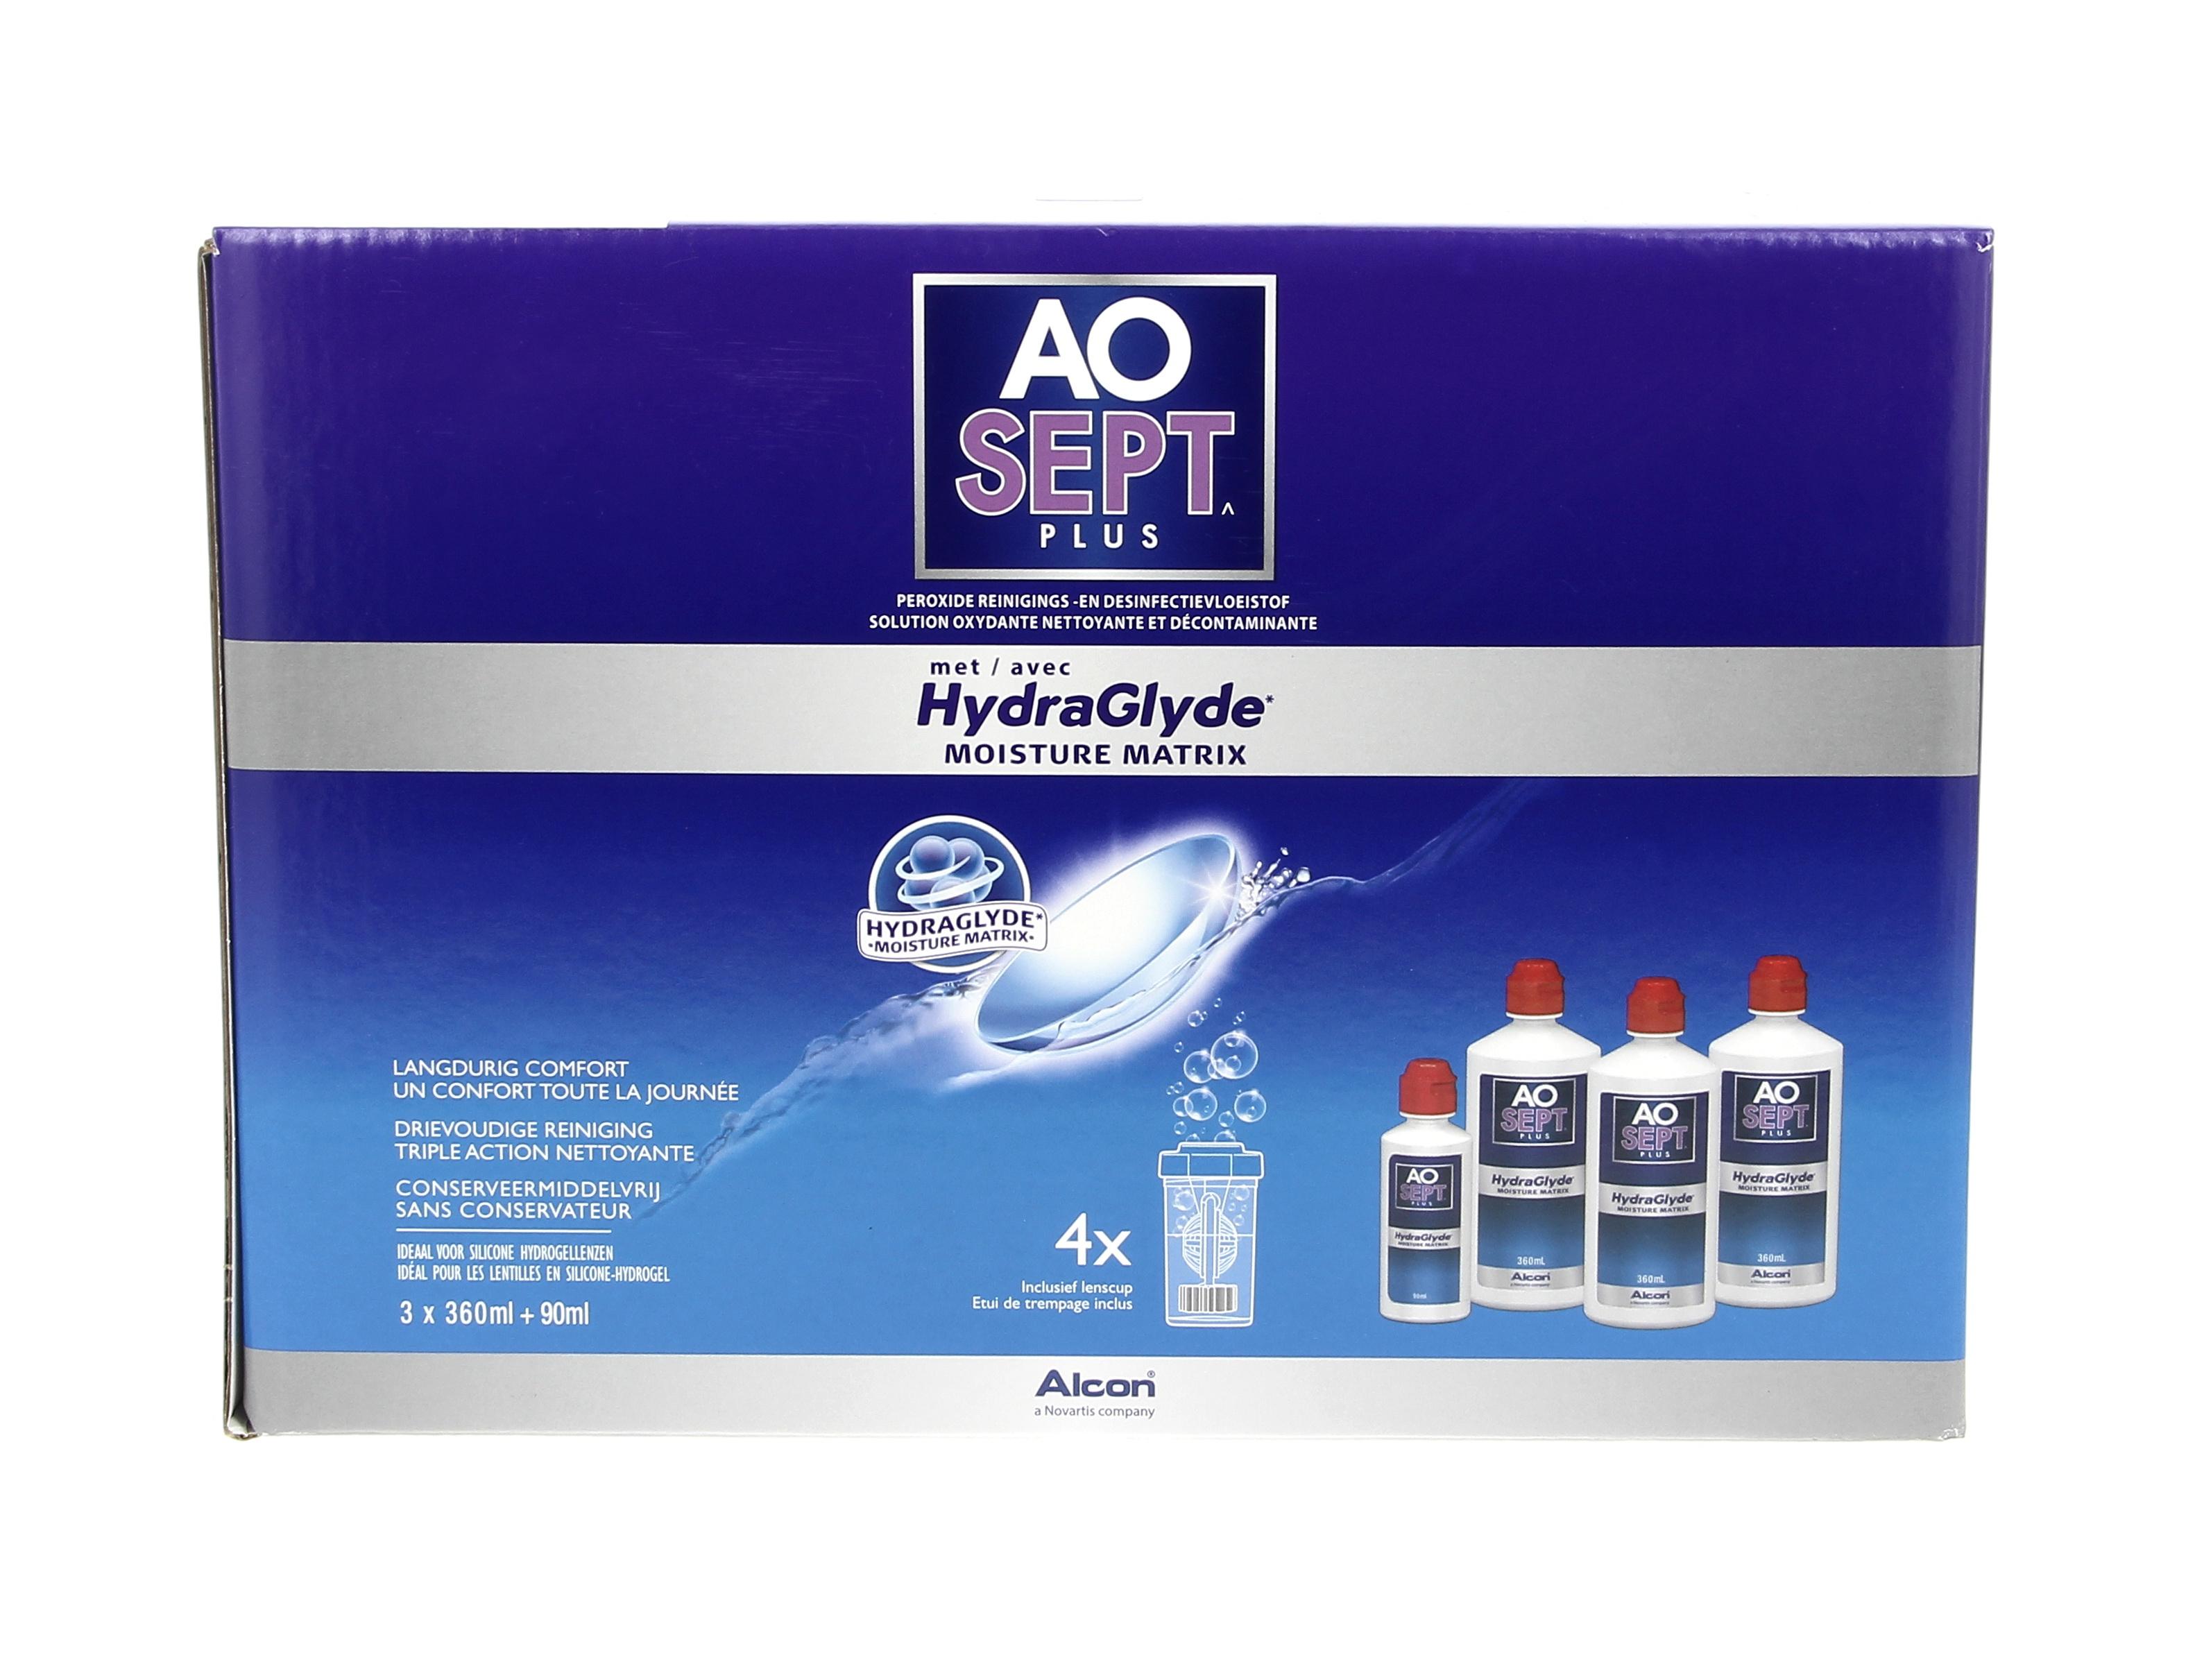 AOSEPT PLUS HydraGlyde Coffret Eco 3 x 360 ml + 1